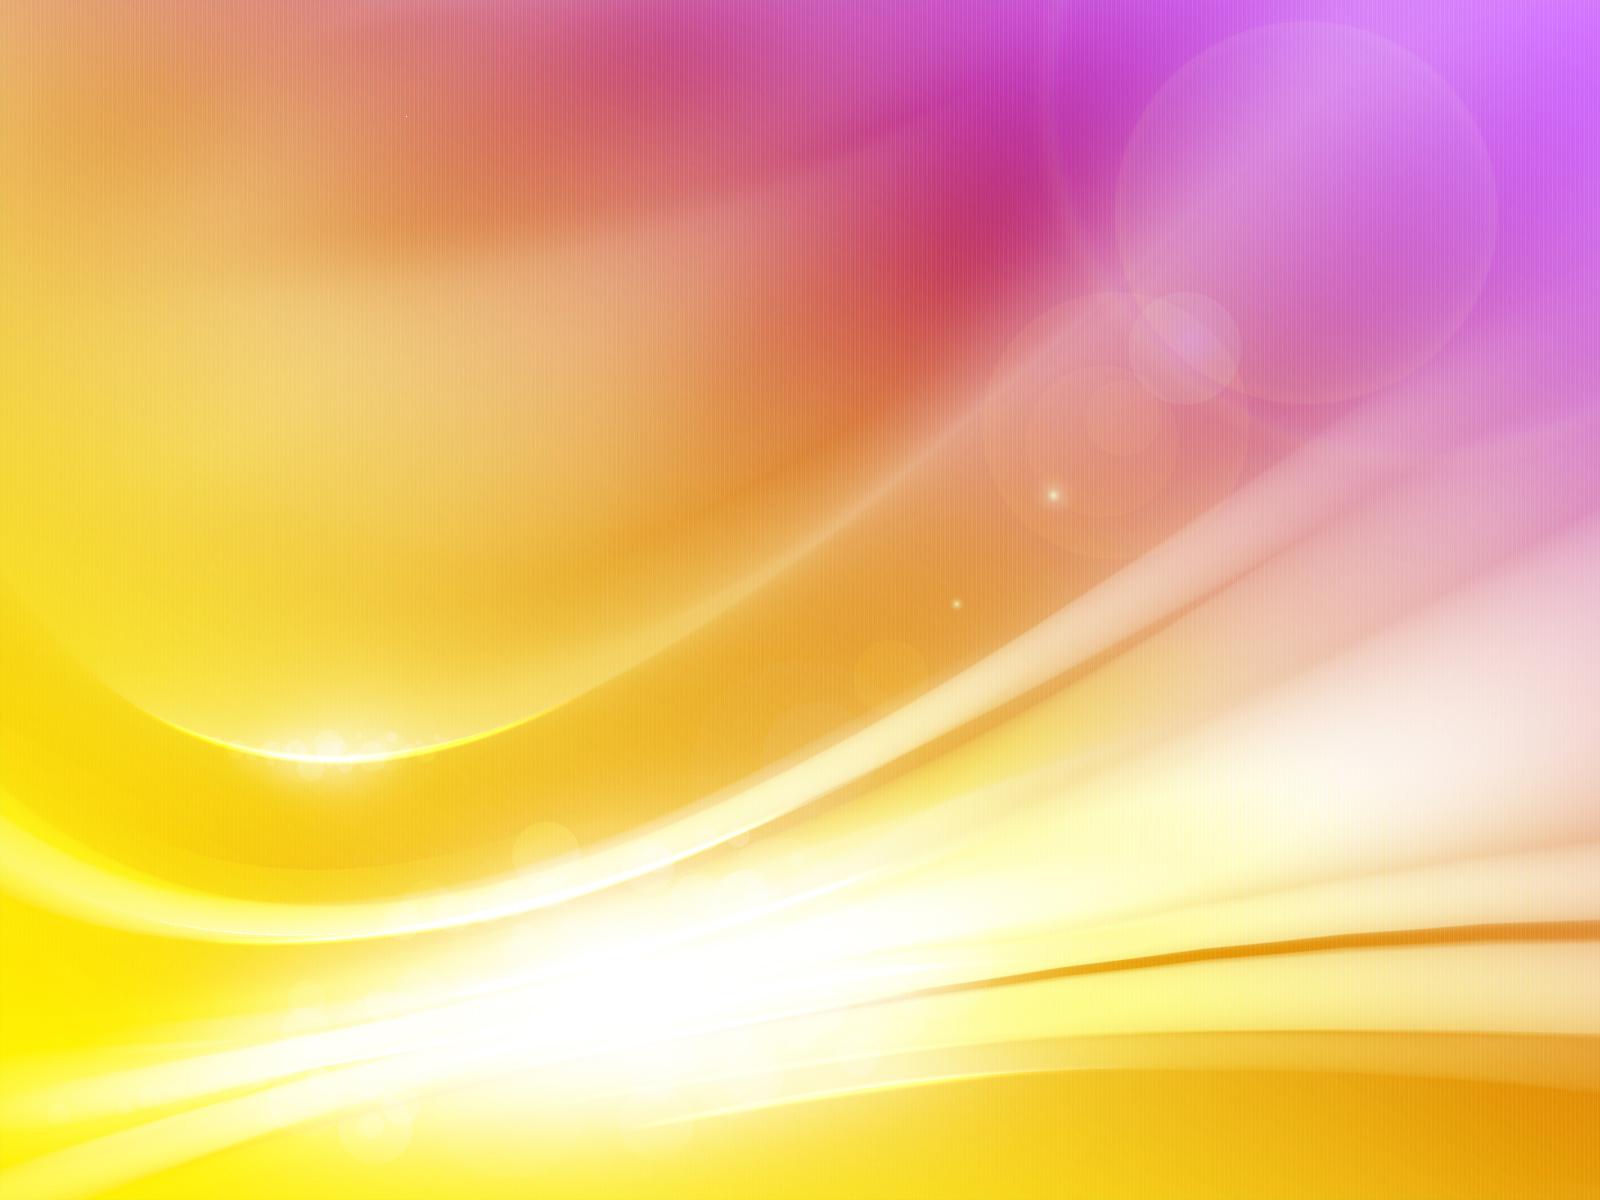 top desktop yellow wallpapers yellow wallpaper yellow background hd 13 1600x1200